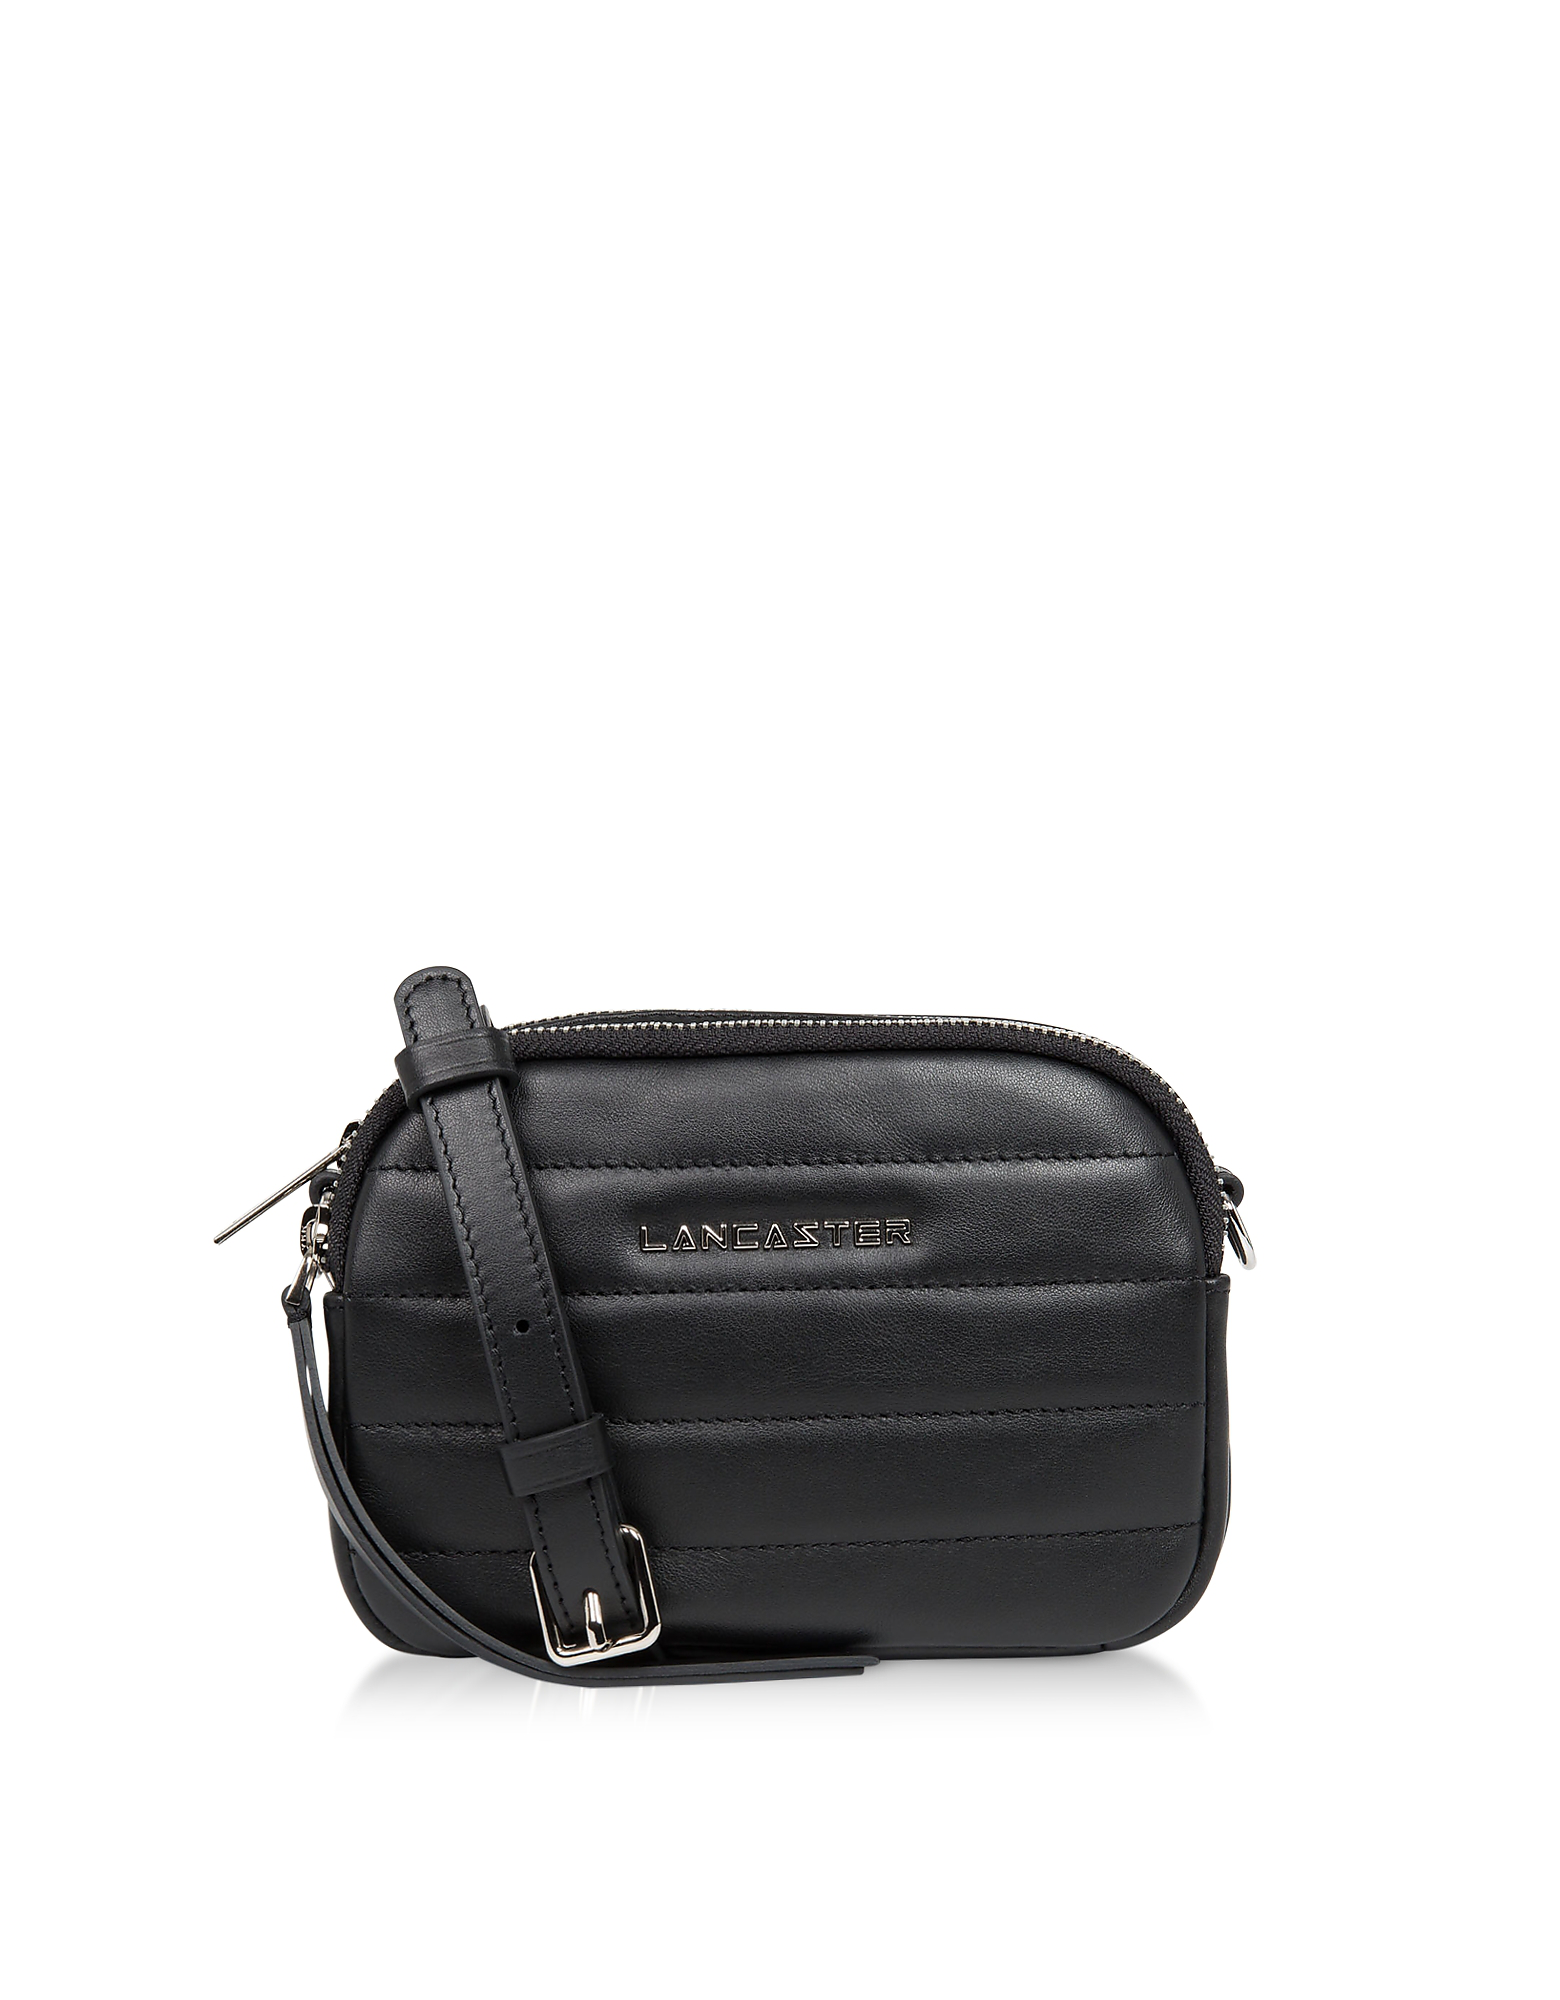 e1a5c65b190795 Lancaster Parisienne Couture Mini Crossbody Bag In Black   ModeSens